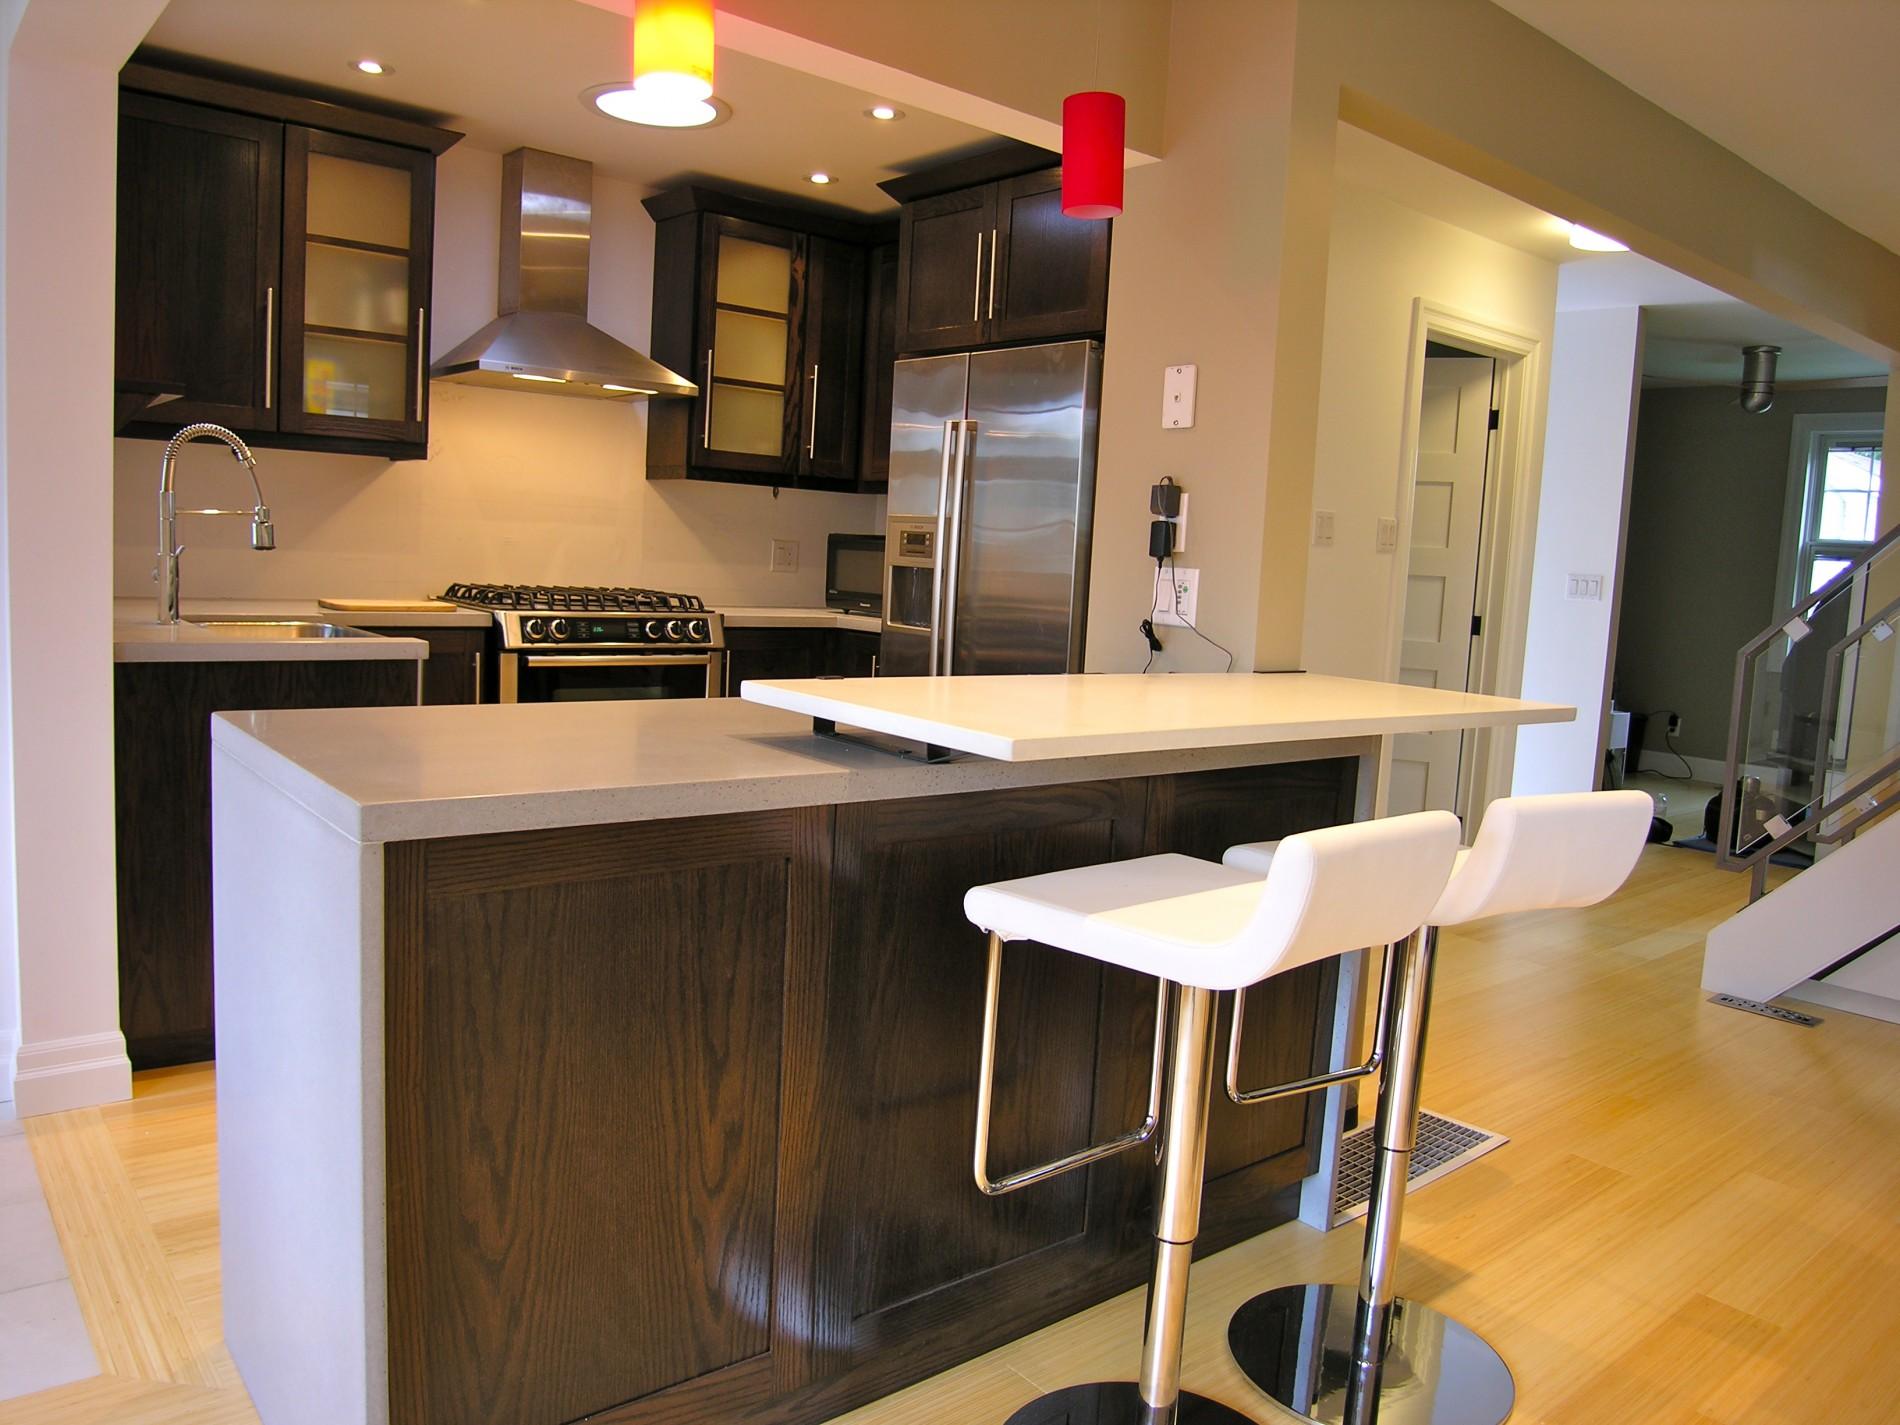 East York Modern Kitchen - Featured Image